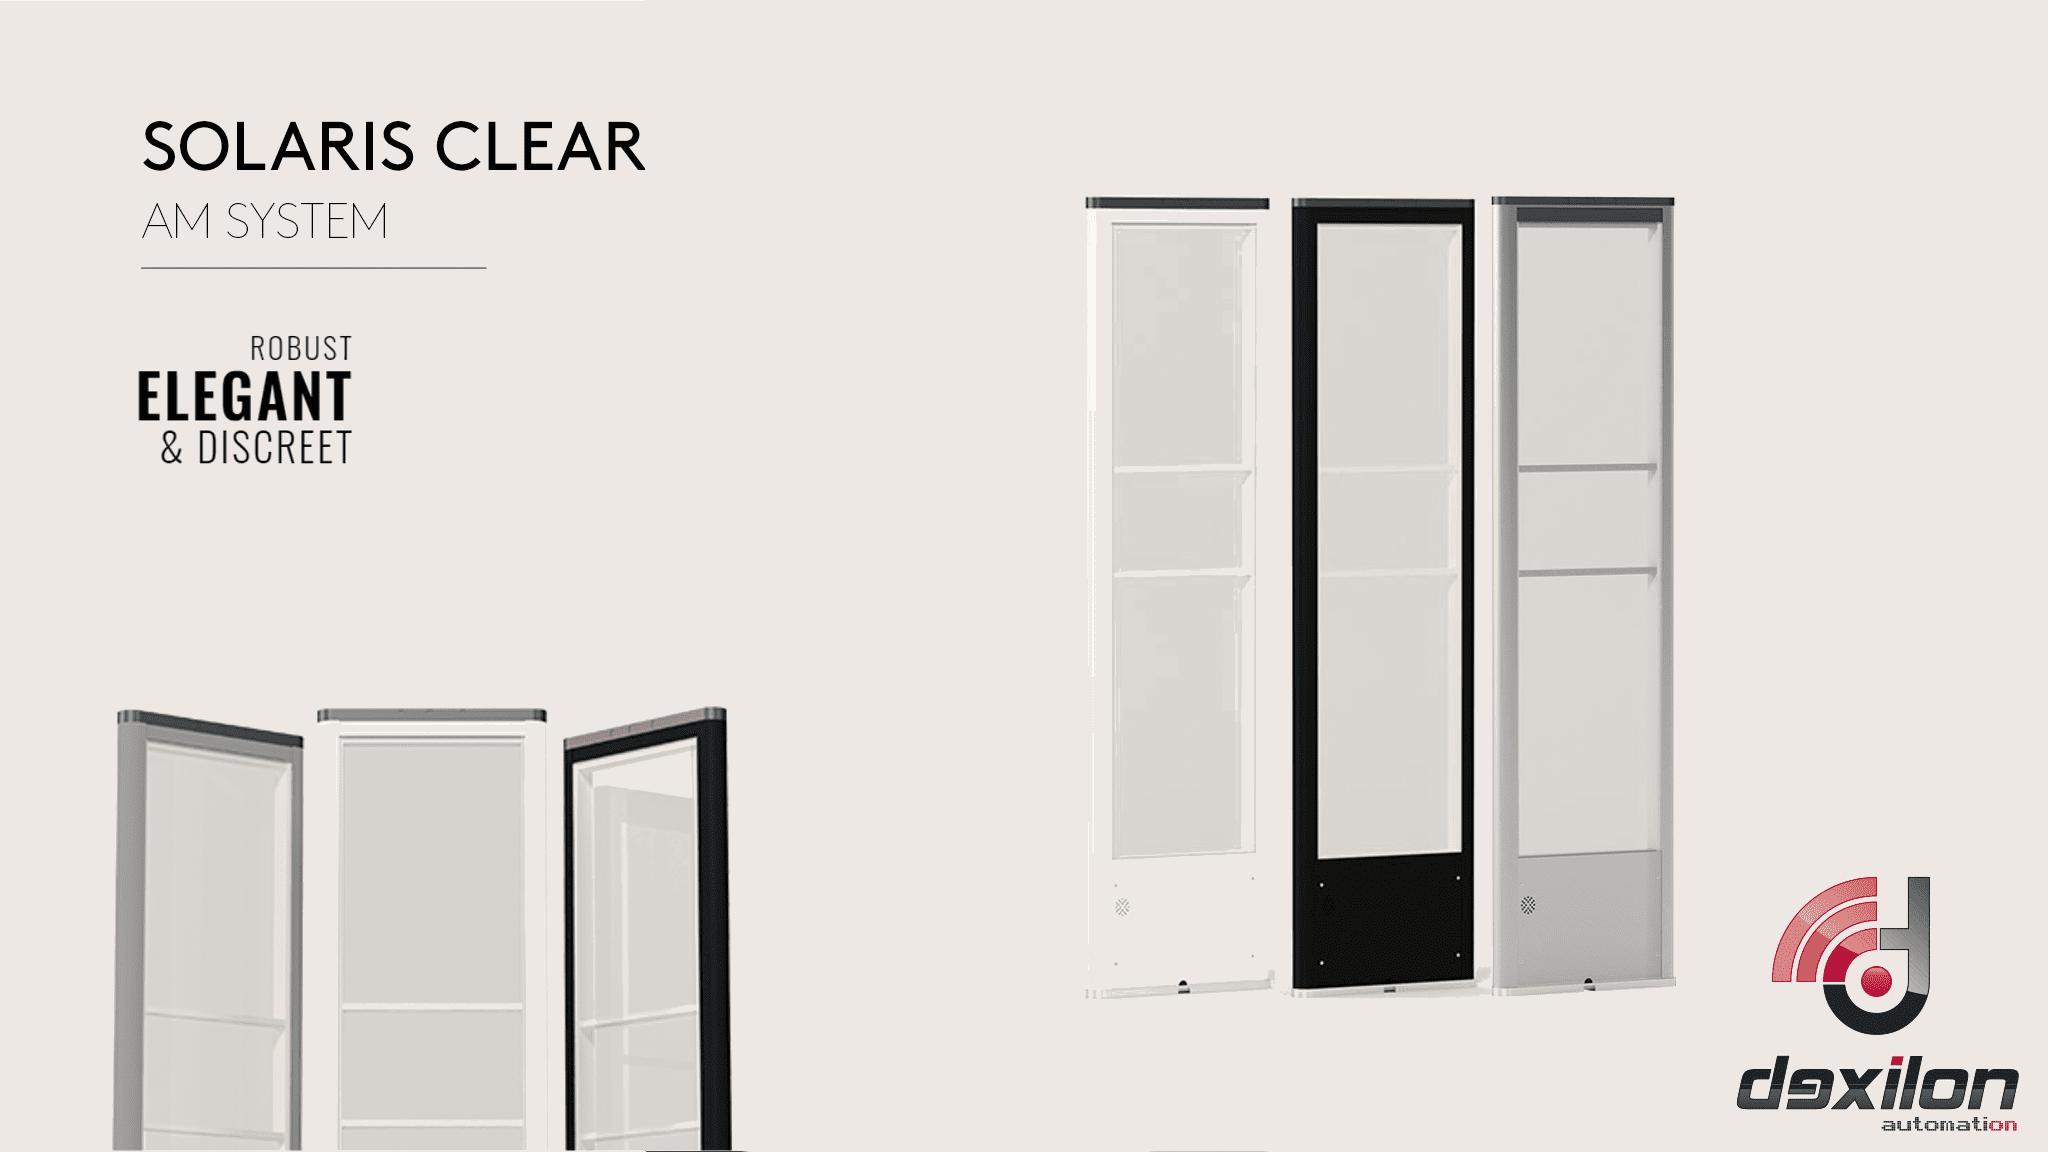 Dexilon - Solaris - Clear - G10V - AM - Akoesto Magnetisch - artikelbeveiliging - winkelbeveiliging - productbeveiliging